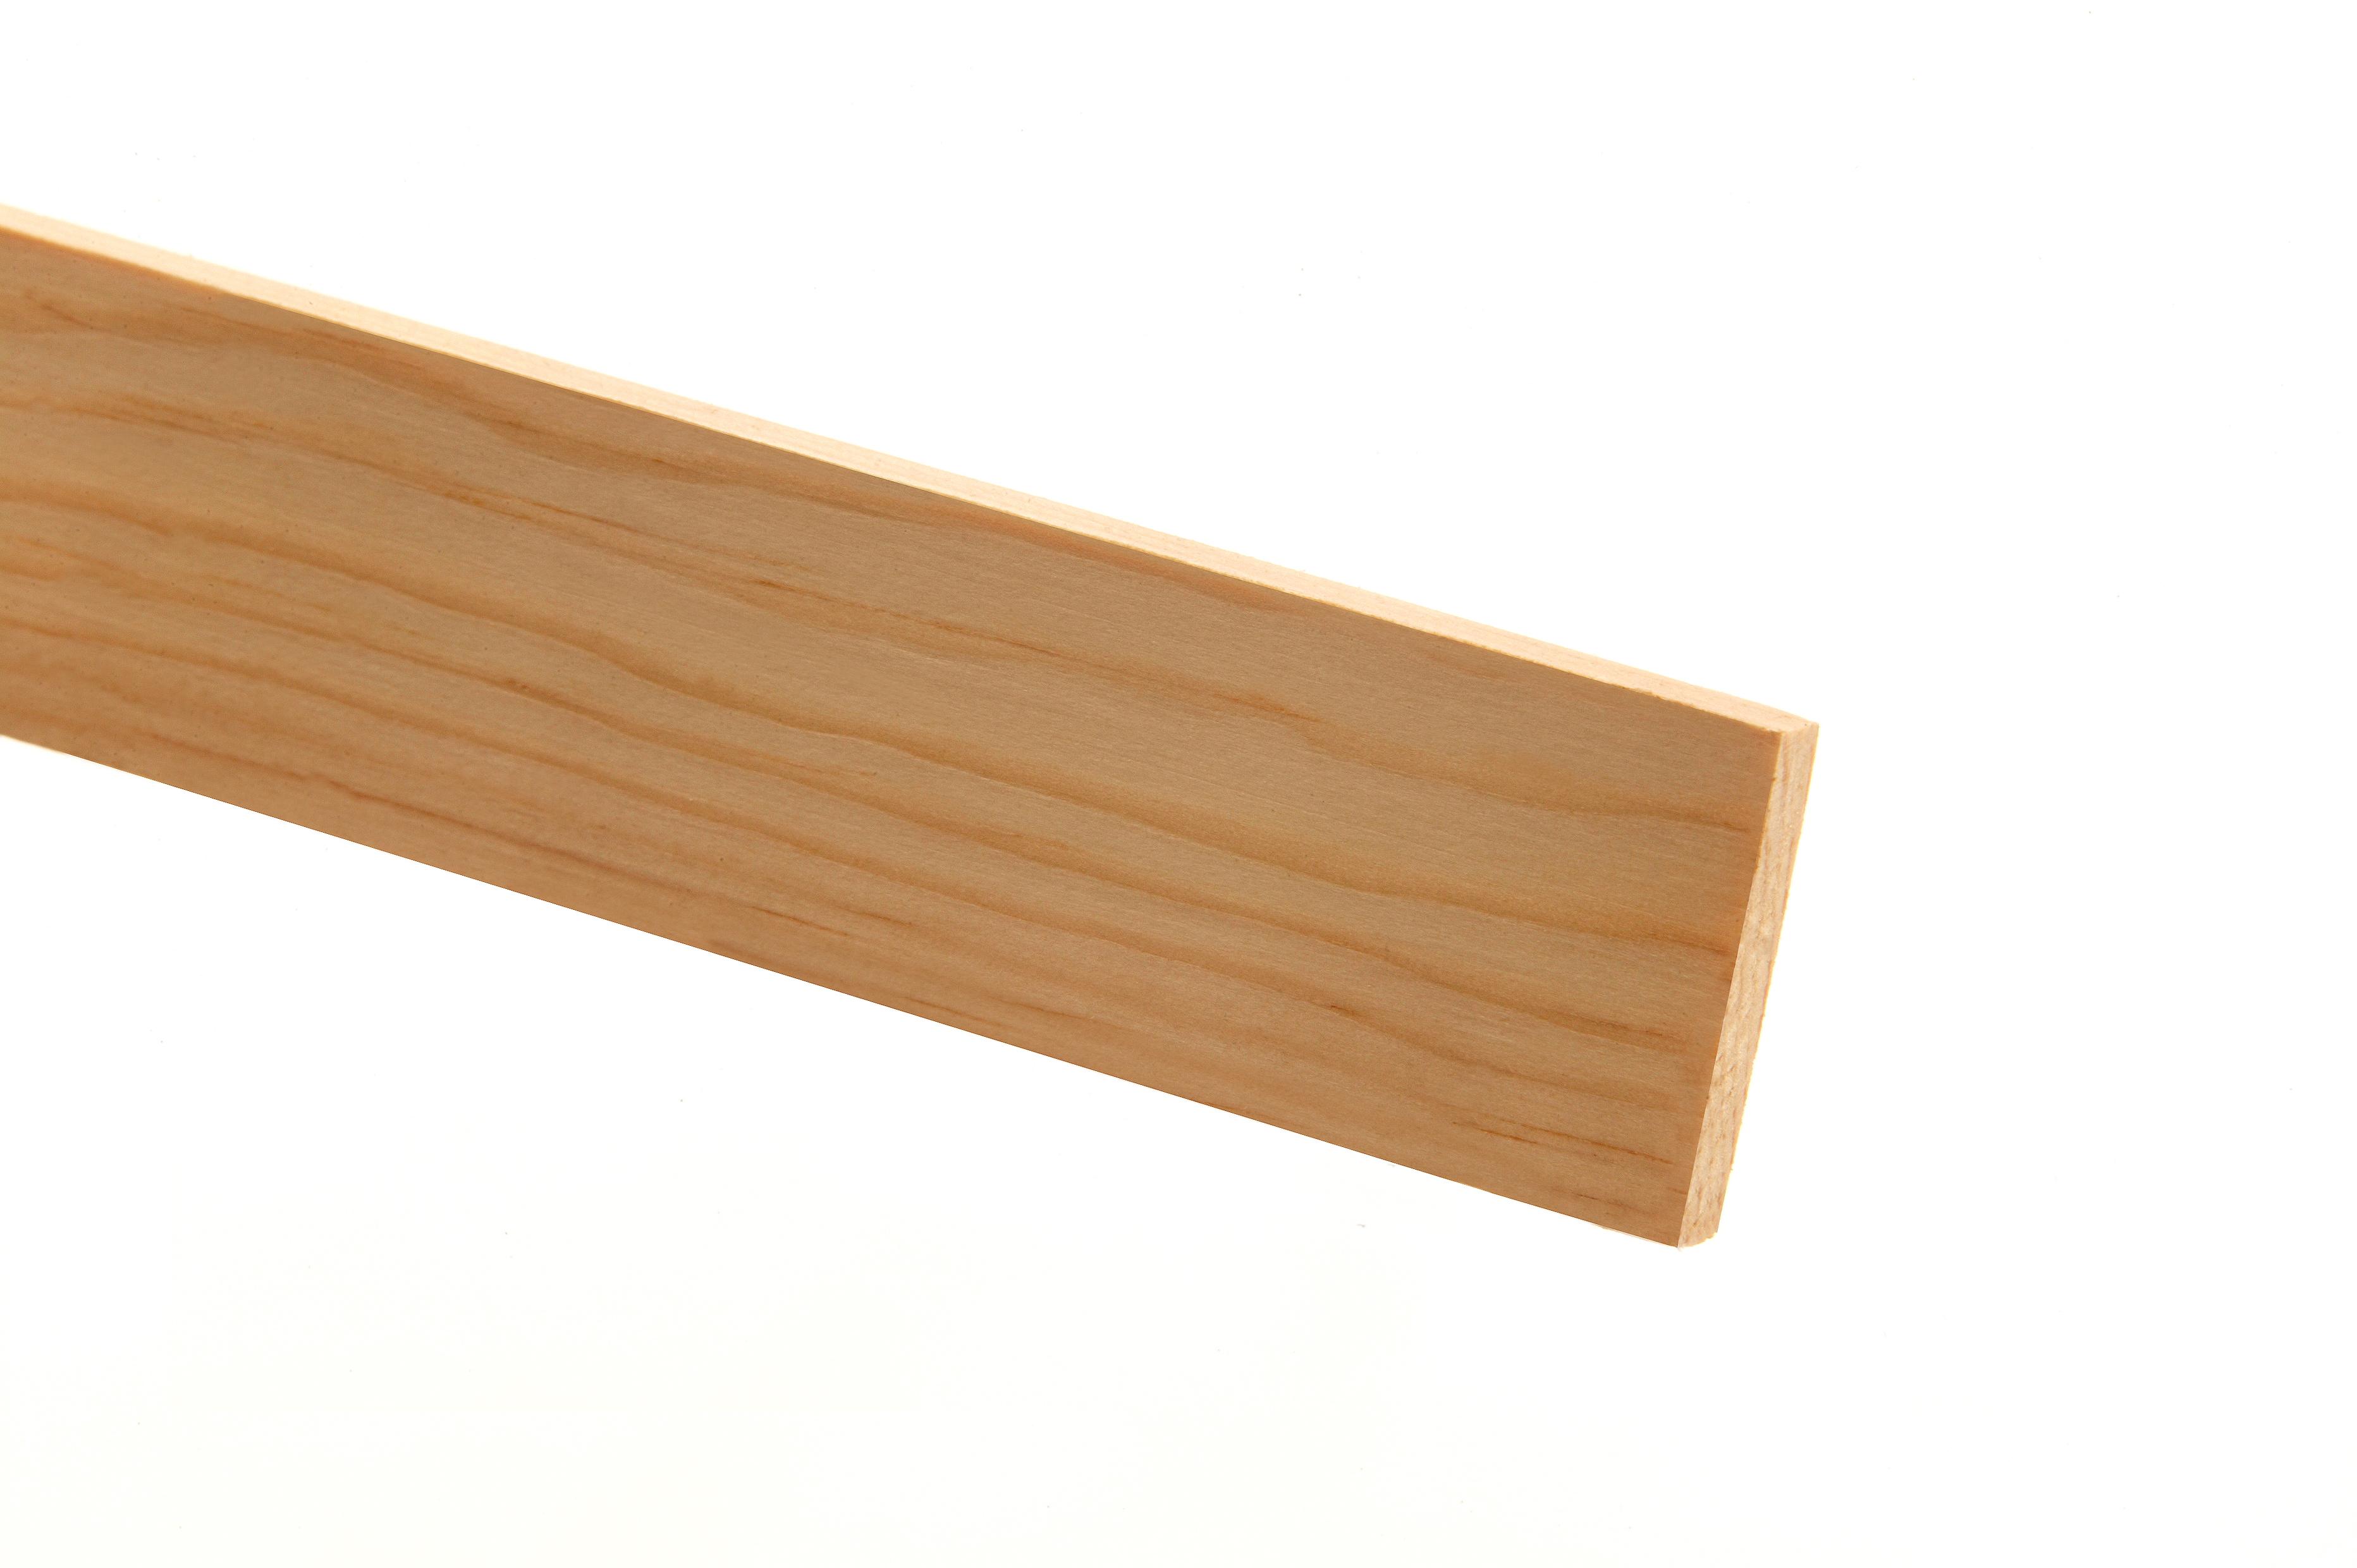 10 Pine PSE Stripwood 46 x 46 x 2400mm